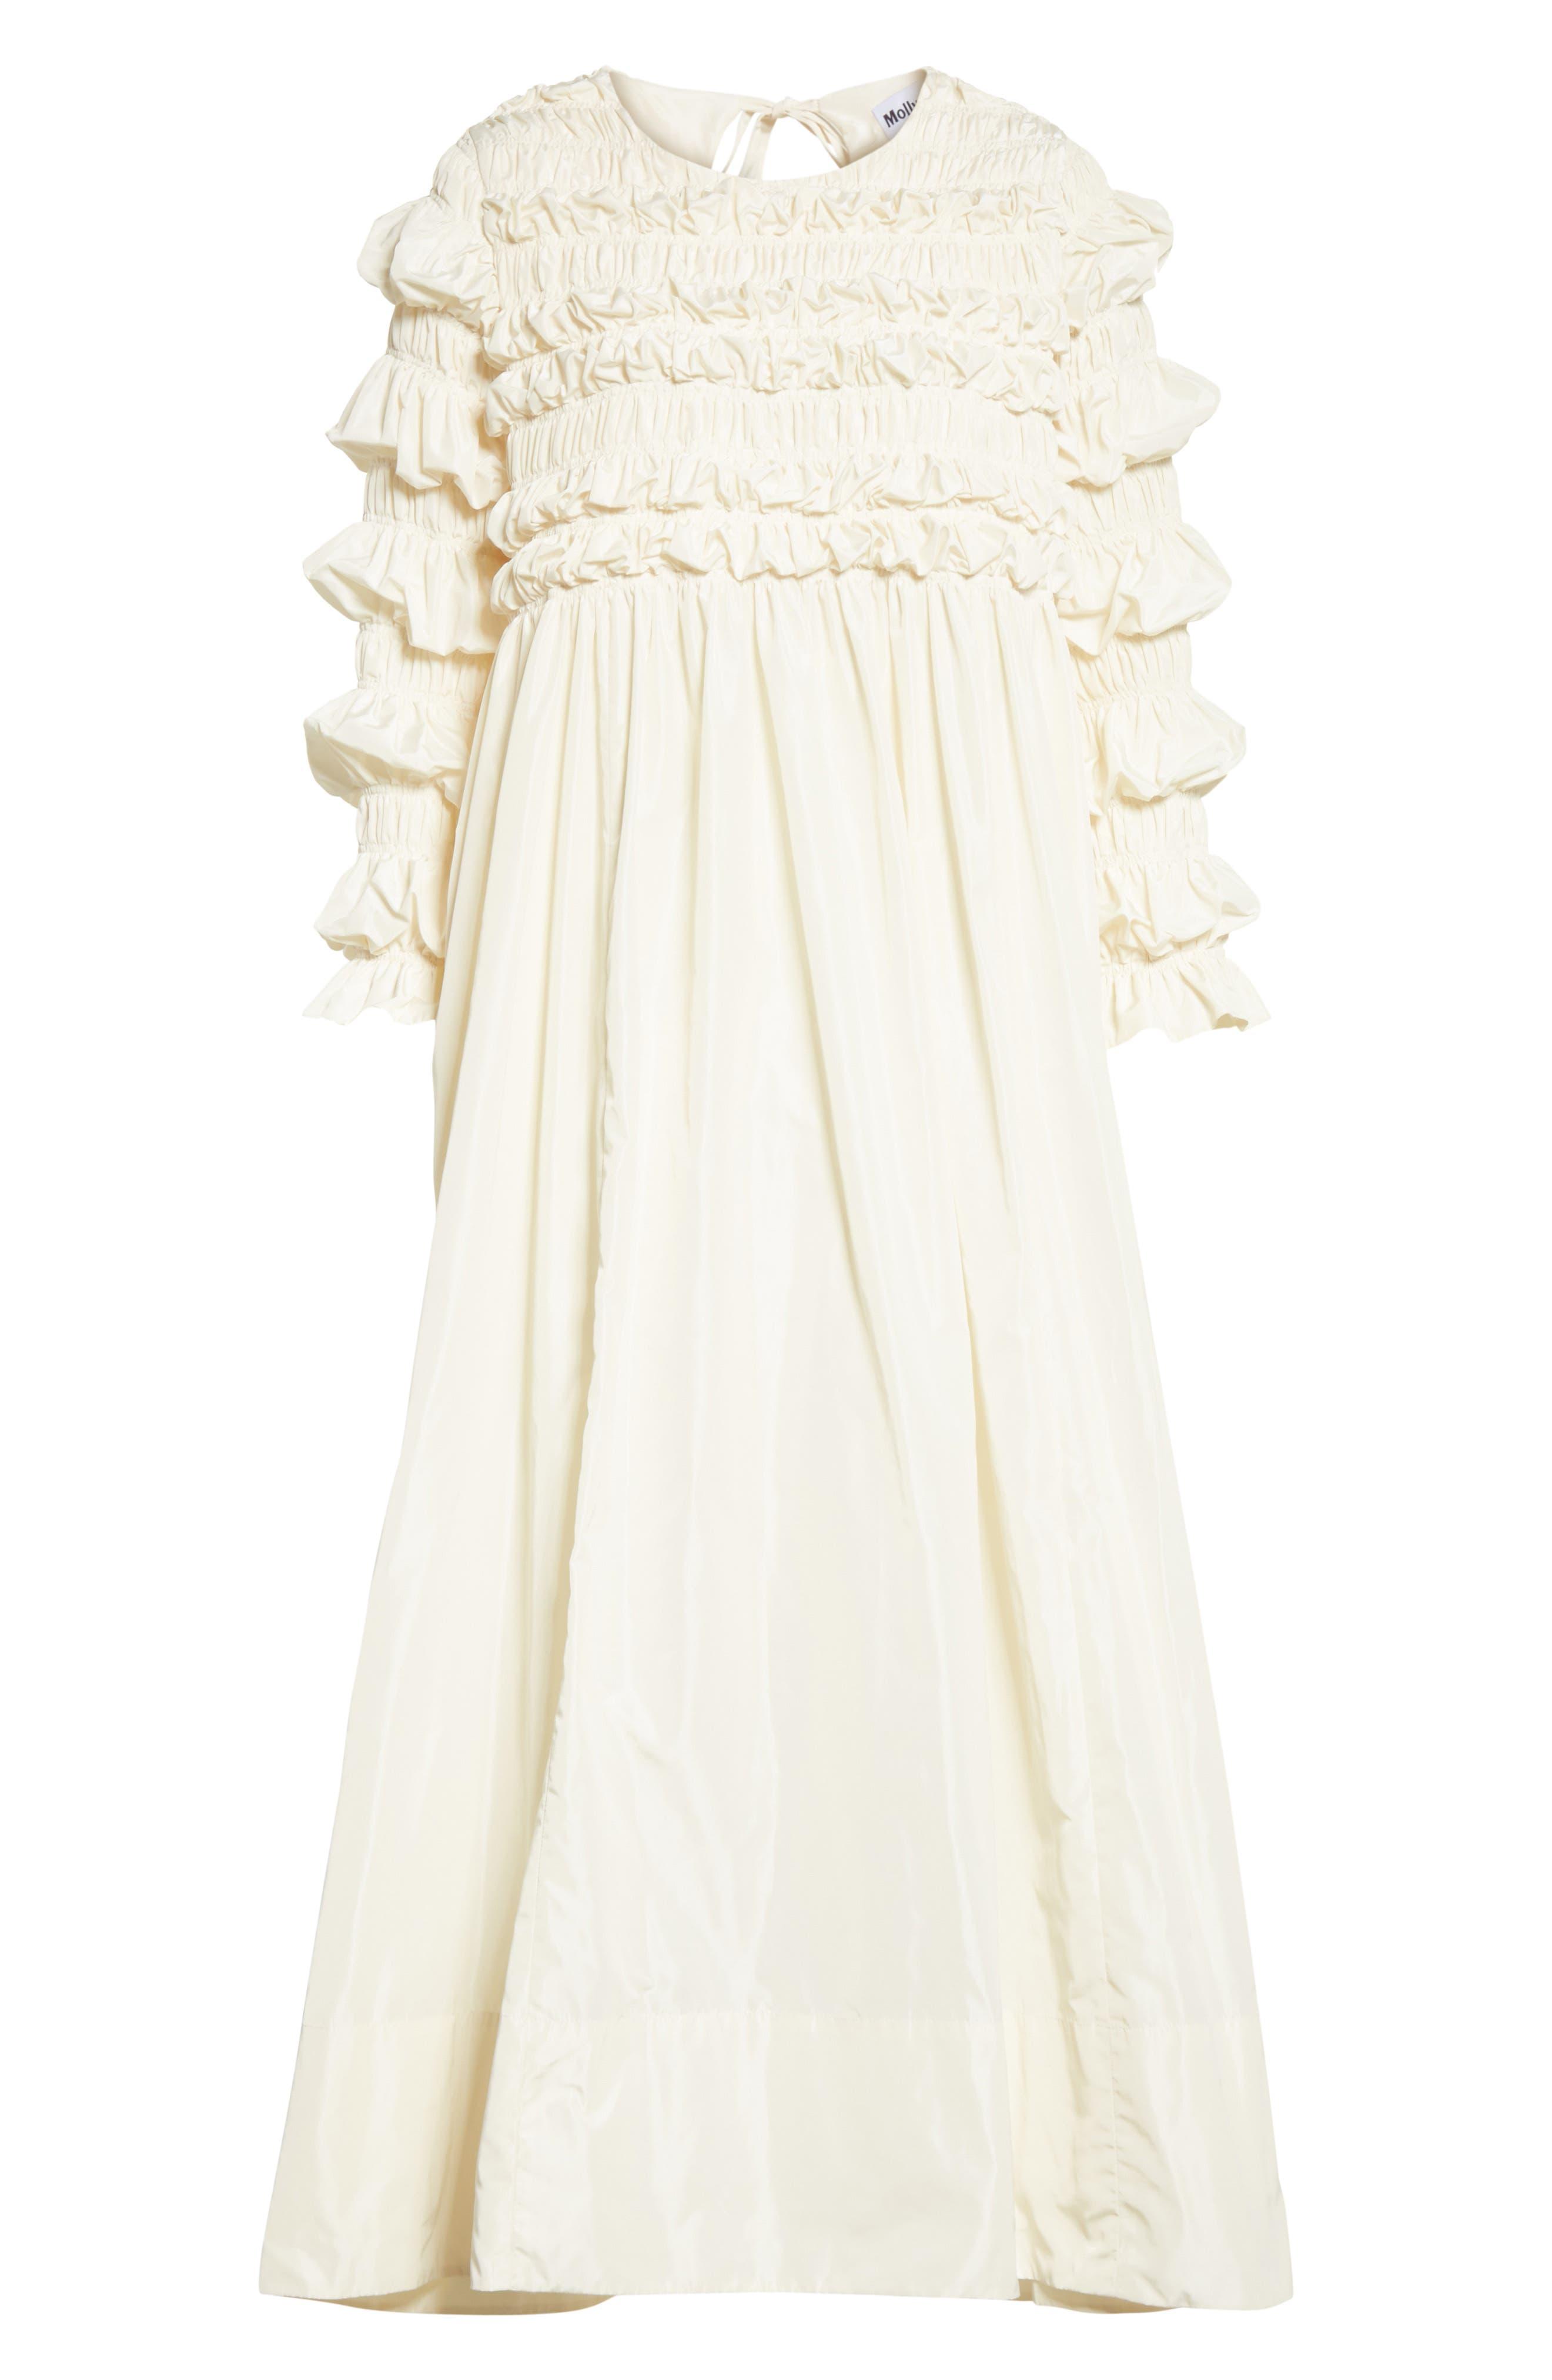 Lizzie Ruffled Taffeta Dress,                             Alternate thumbnail 6, color,                             900